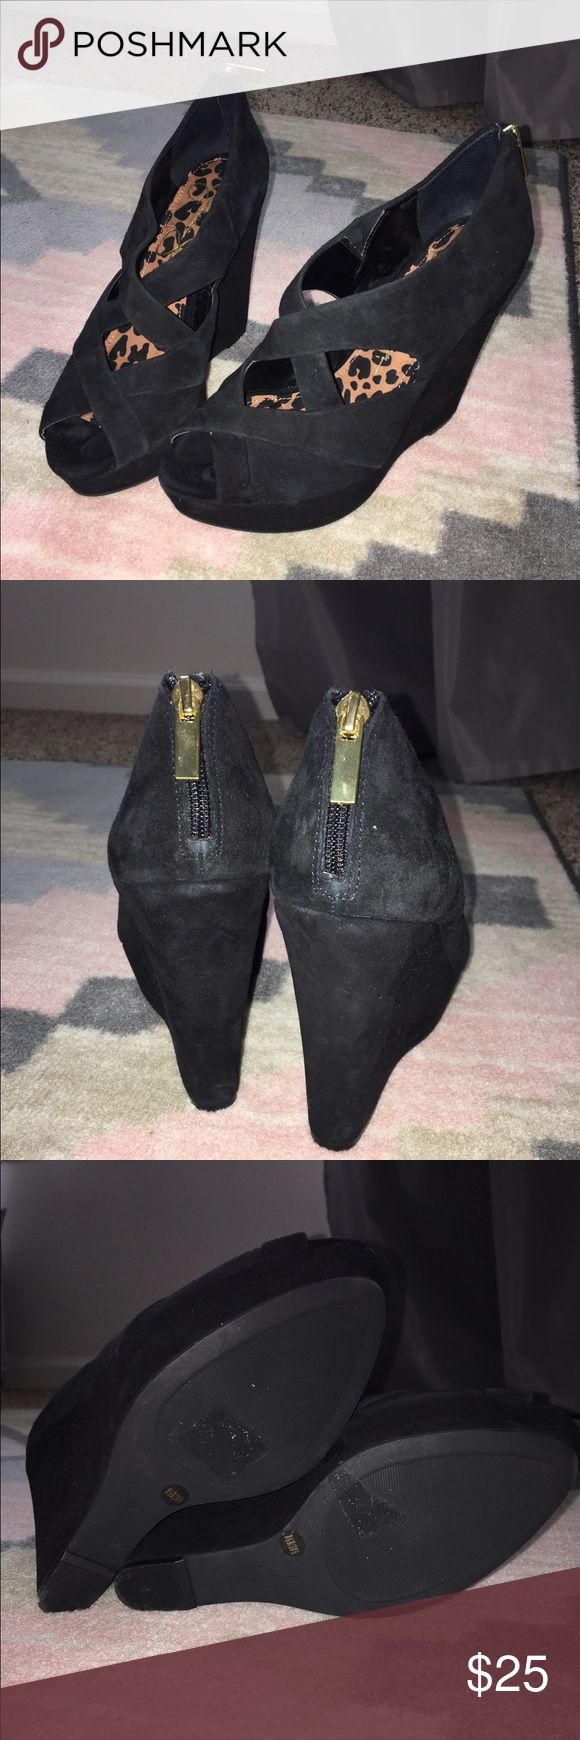 Jessica Simpson Black Suede Wedges Black suede Jessica Simpson Wedges. Worn once. Jessica Simpson Shoes Heels